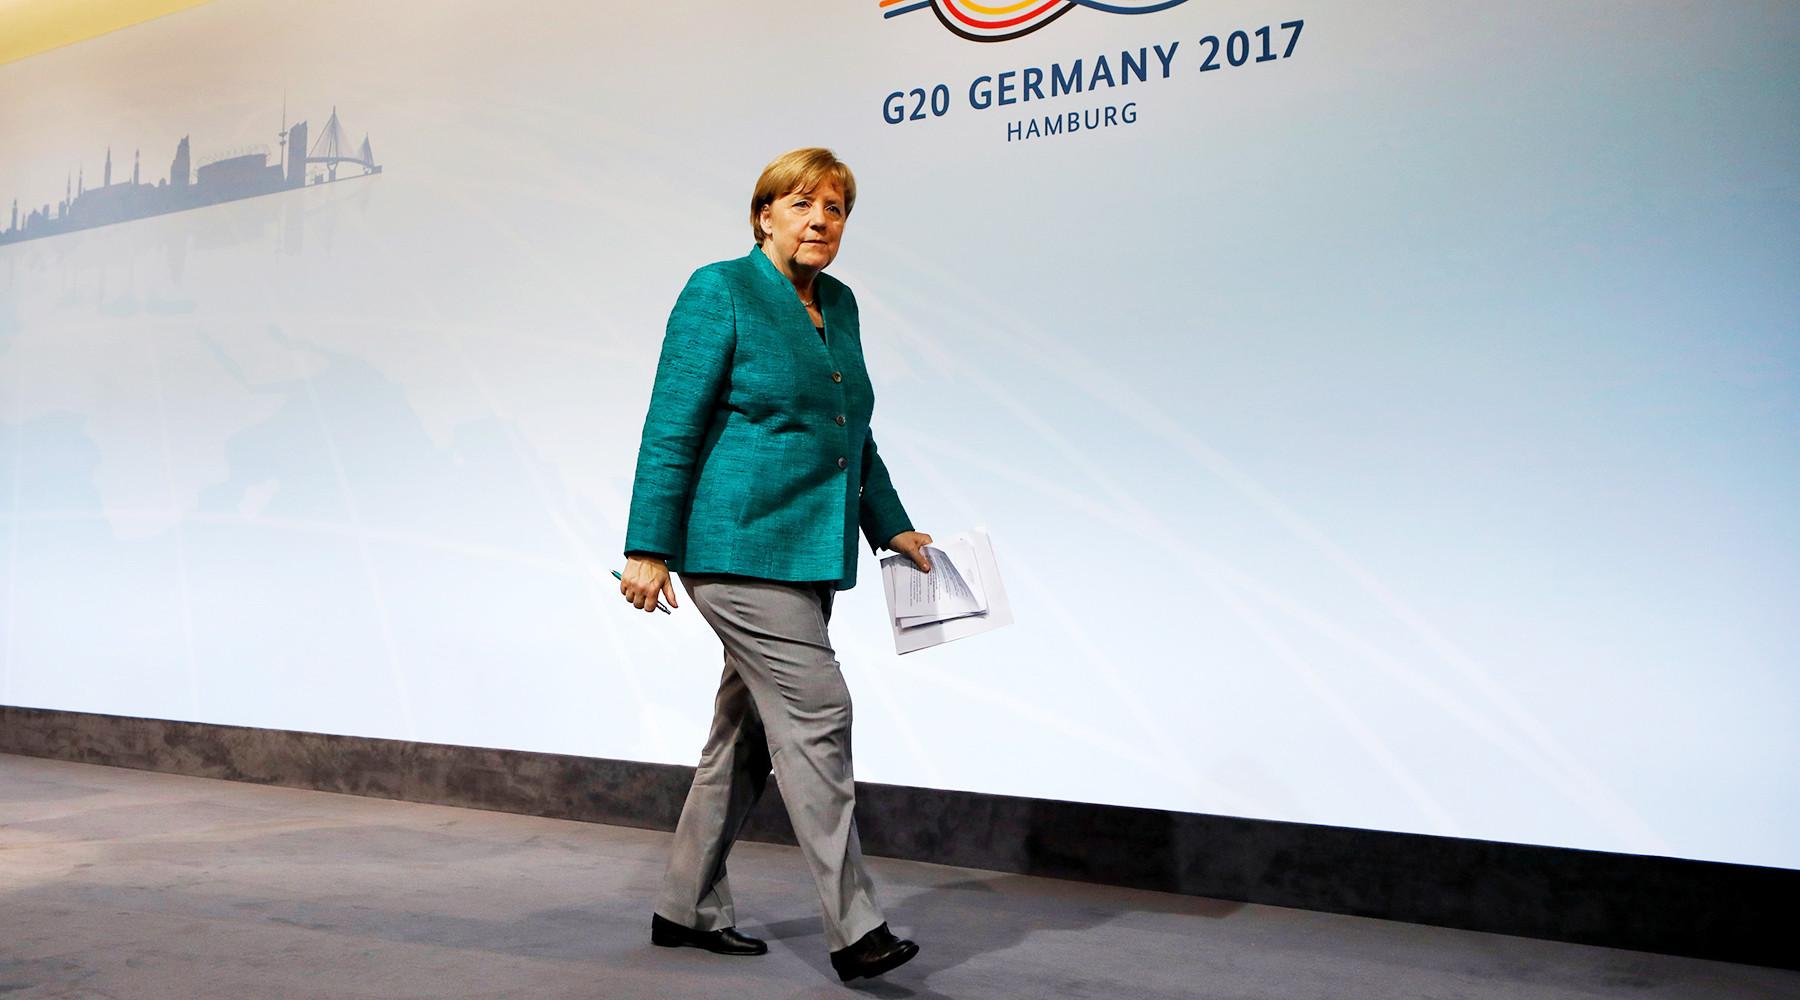 Как Трамп объяснил участие Иванки в саммите G20